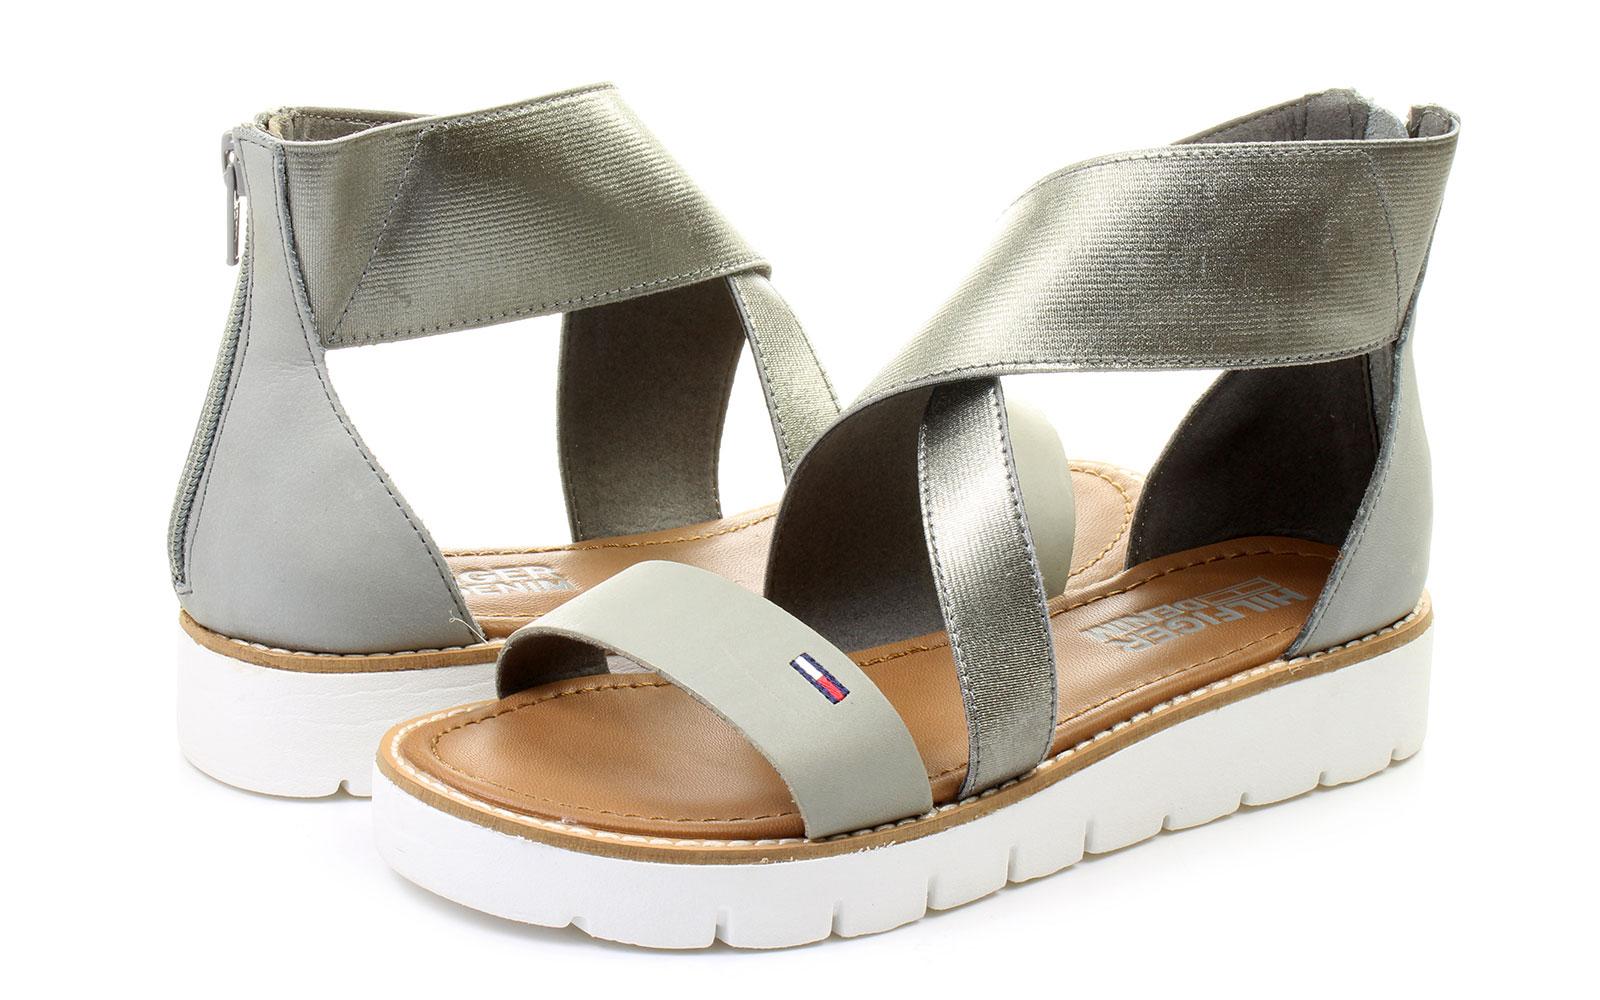 e68be0e119 Tommy Hilfiger Szandál - Sanda 1c - 16S-0861-872 - Office Shoes ...